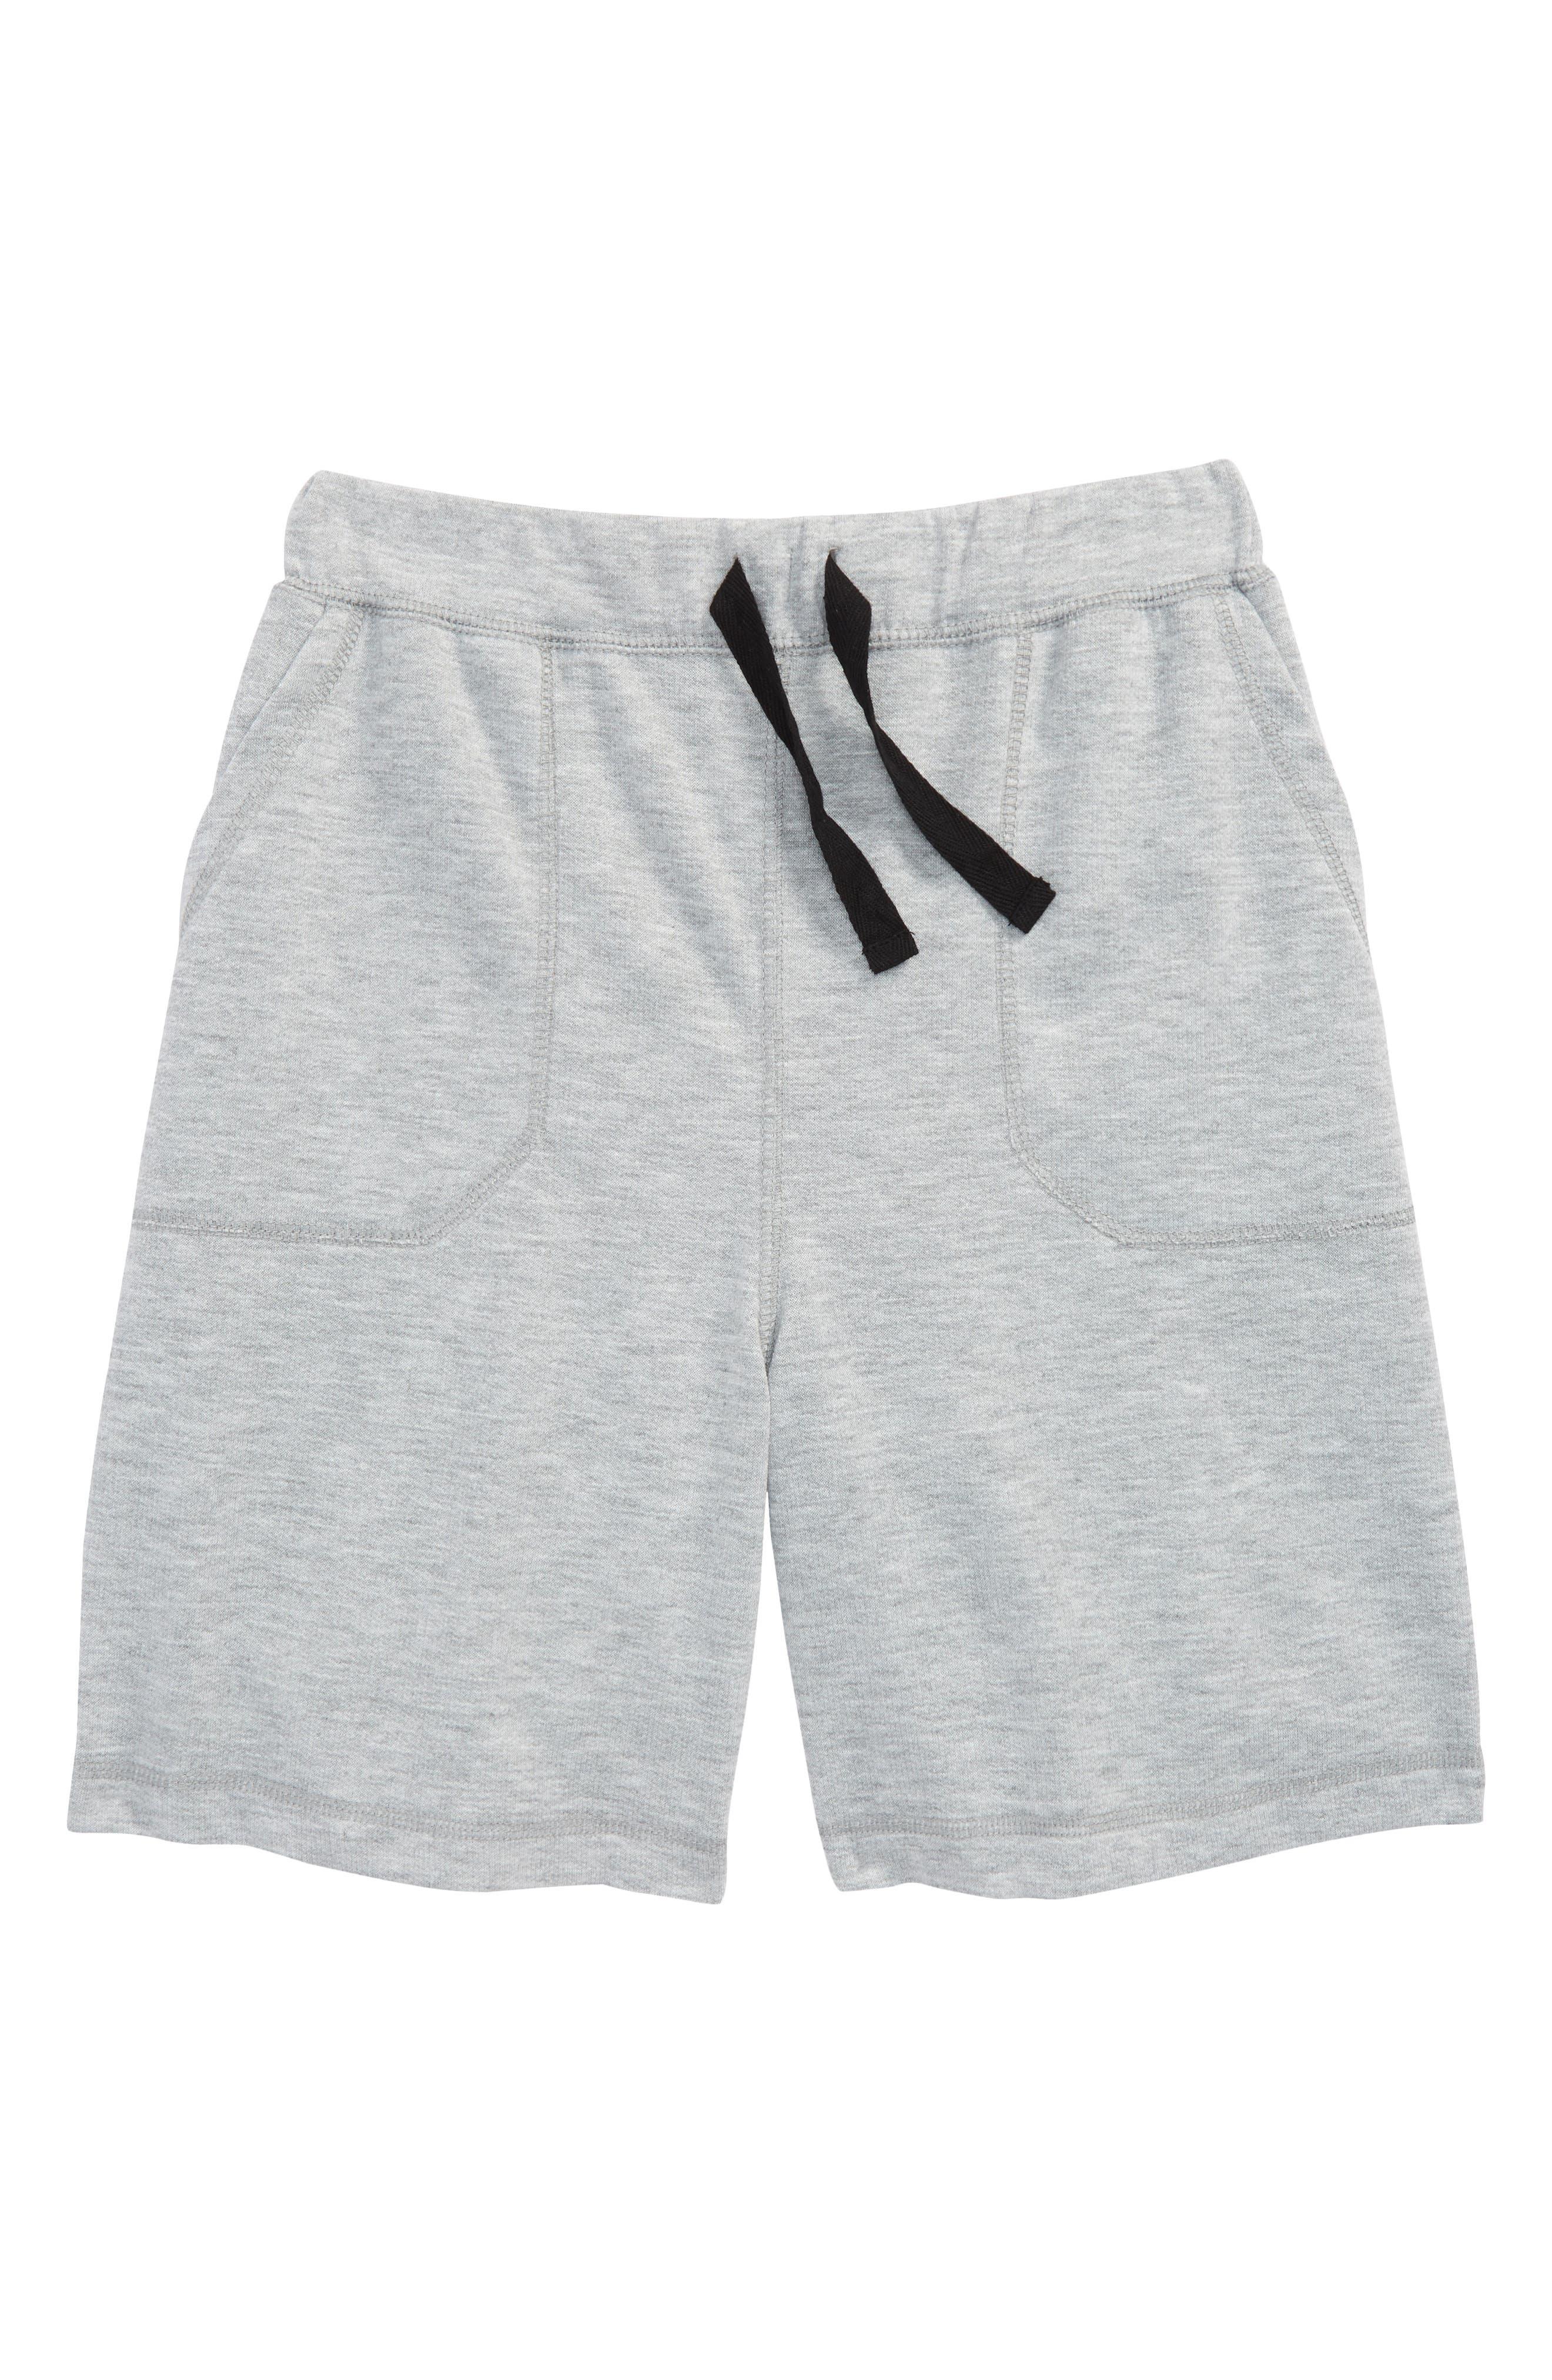 Soft Sleep Shorts,                         Main,                         color, Grey Medium Heather